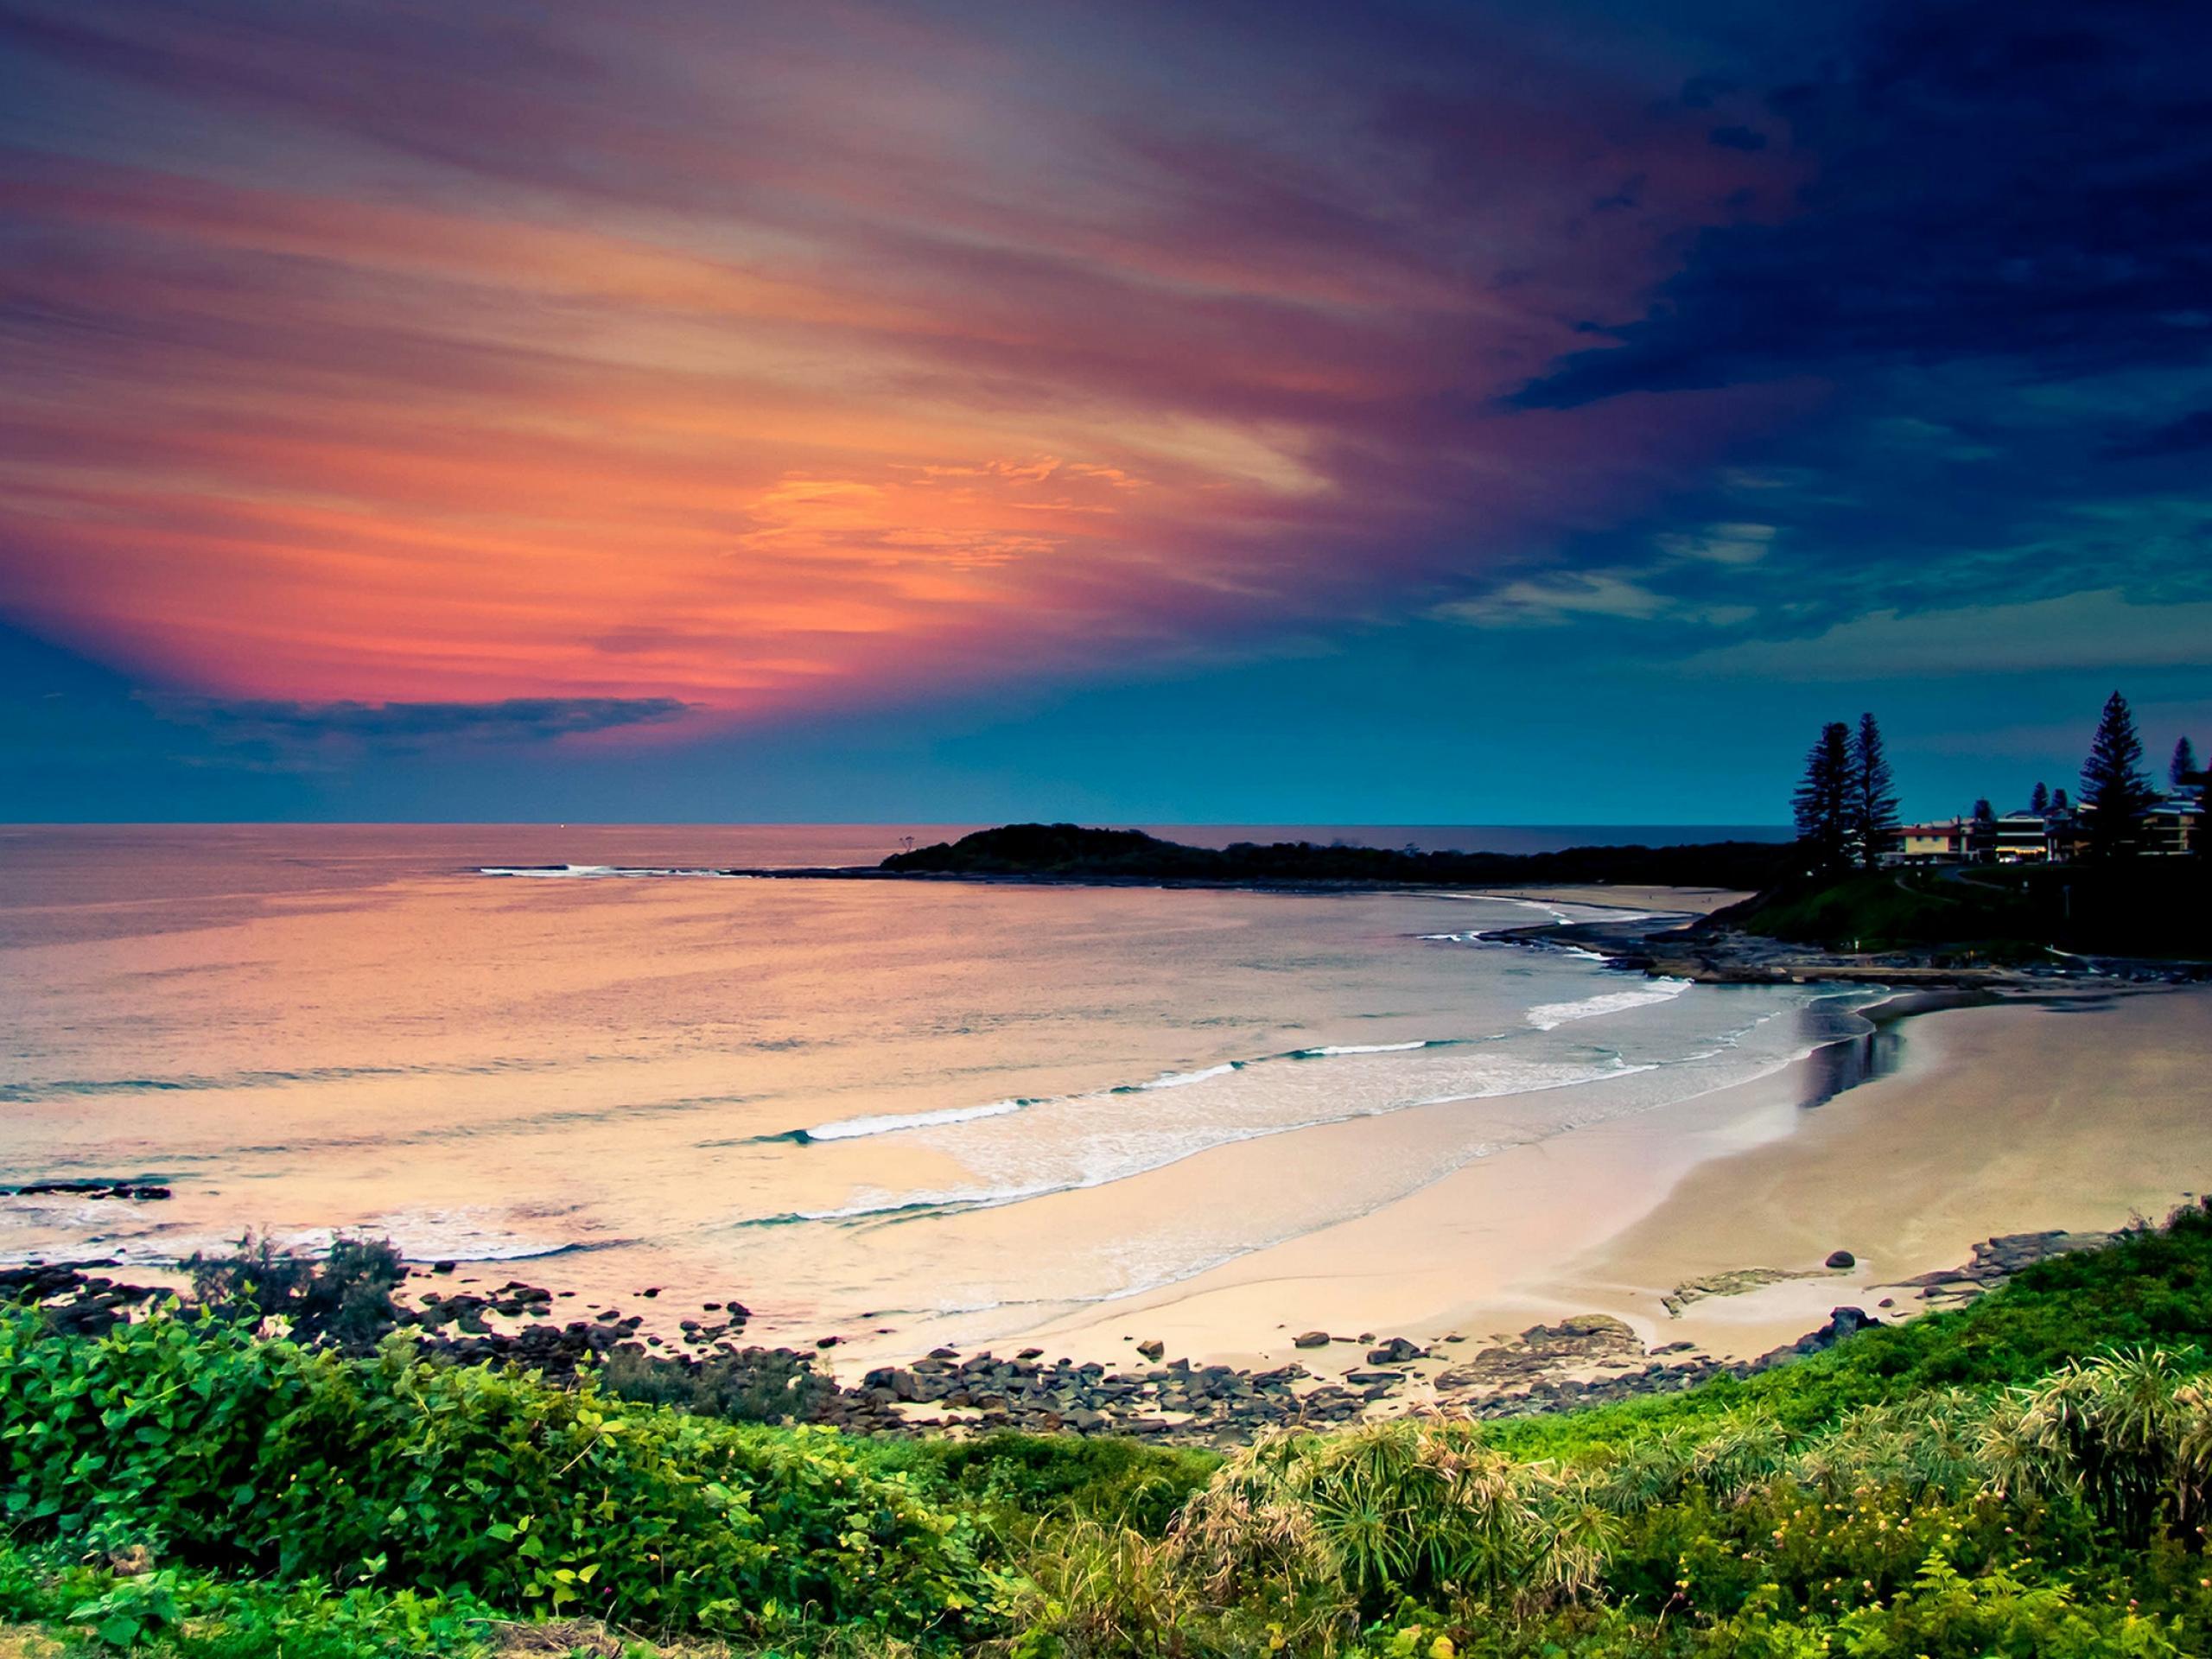 HD Ocean Paradise Wallpapers Desktop HD Wallpaper 2560x1920